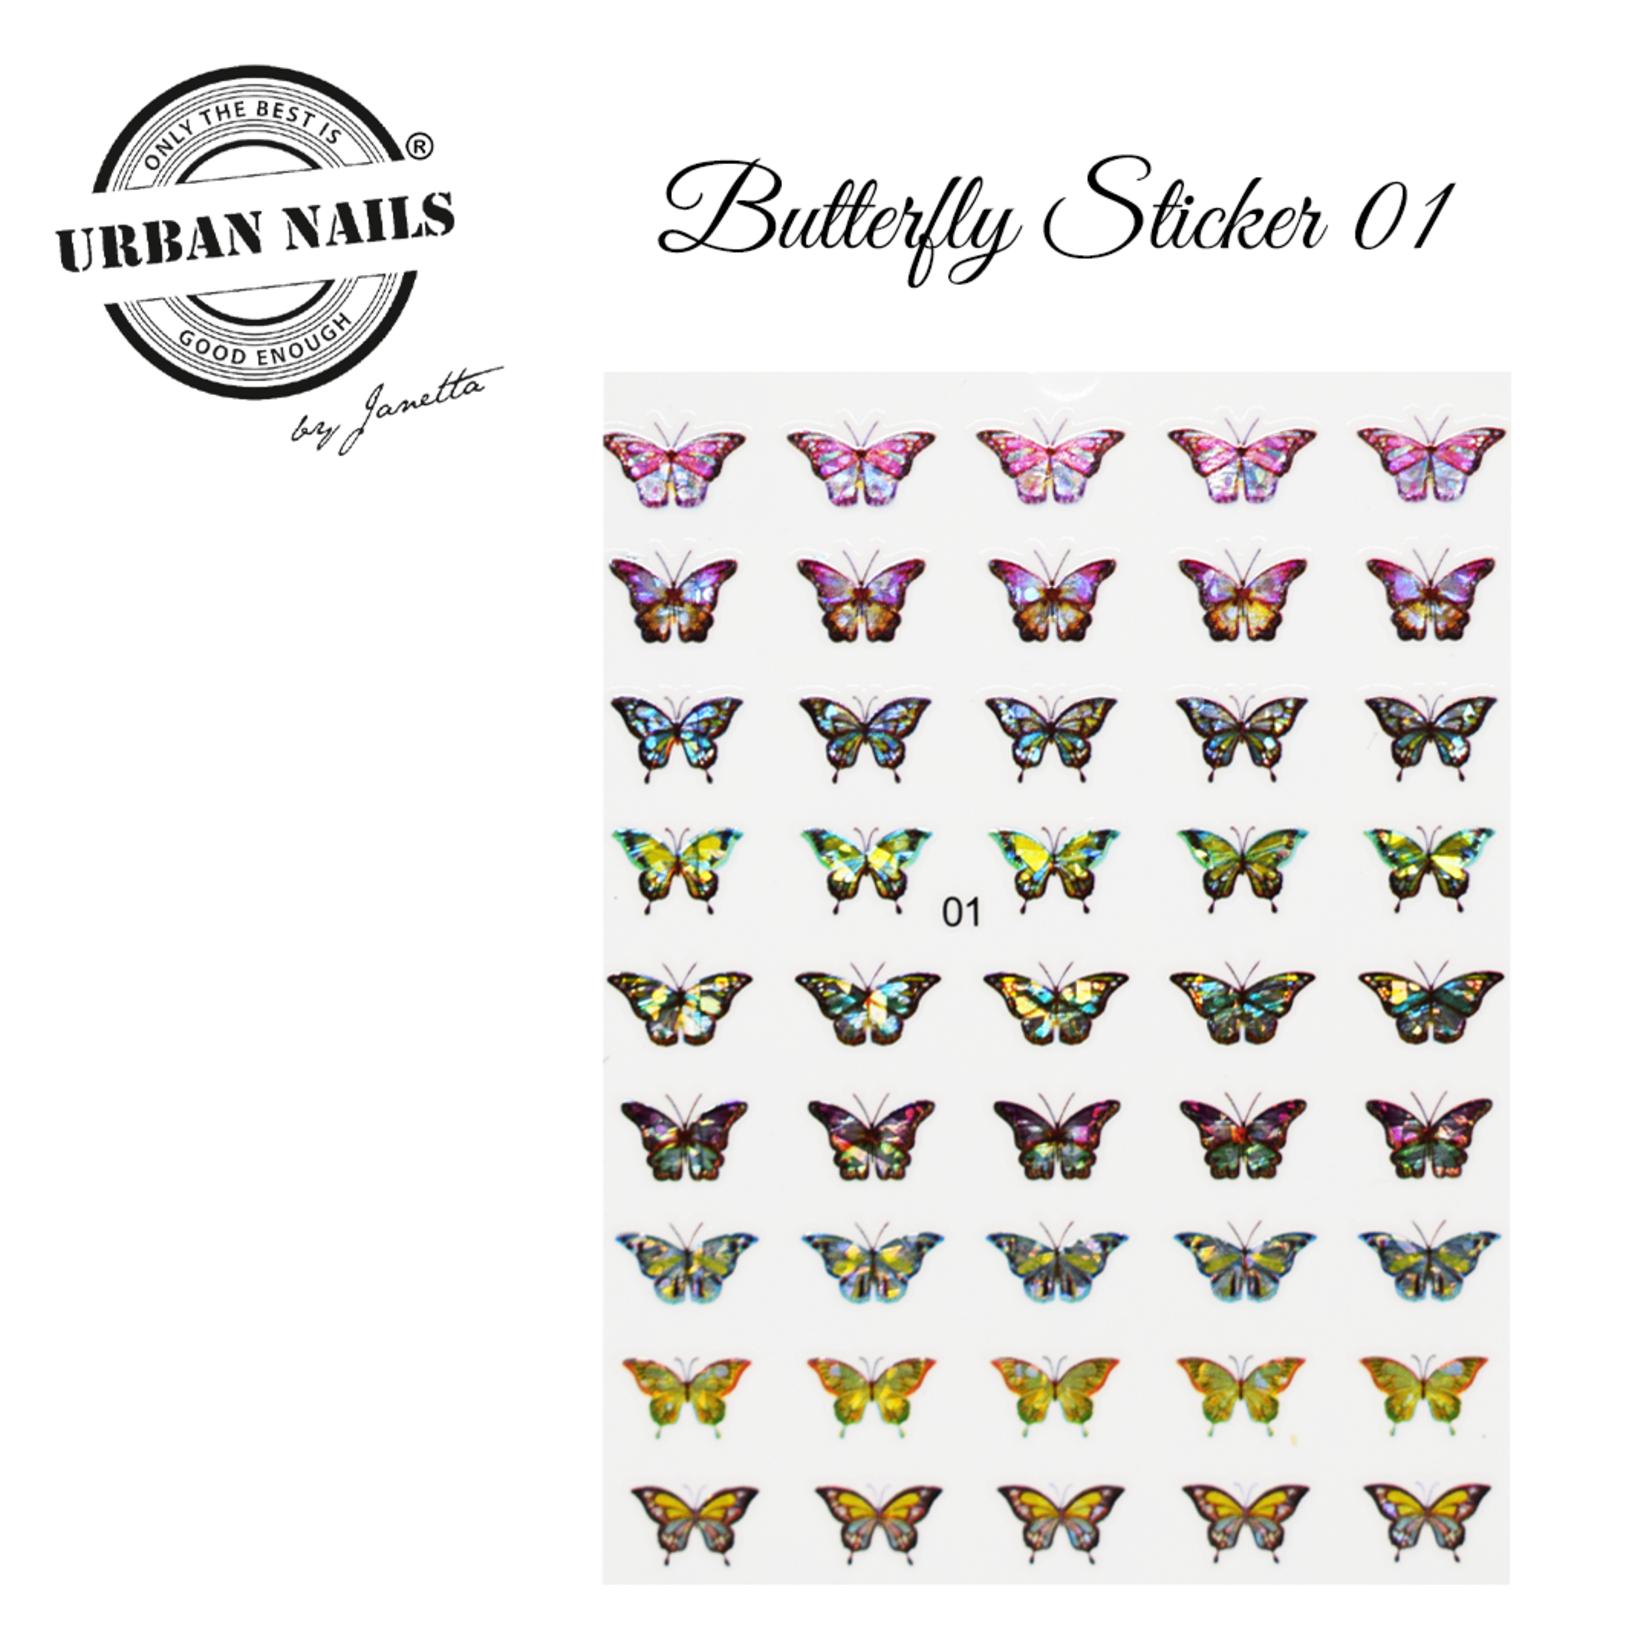 Urban Nails Butterfly sticker 01